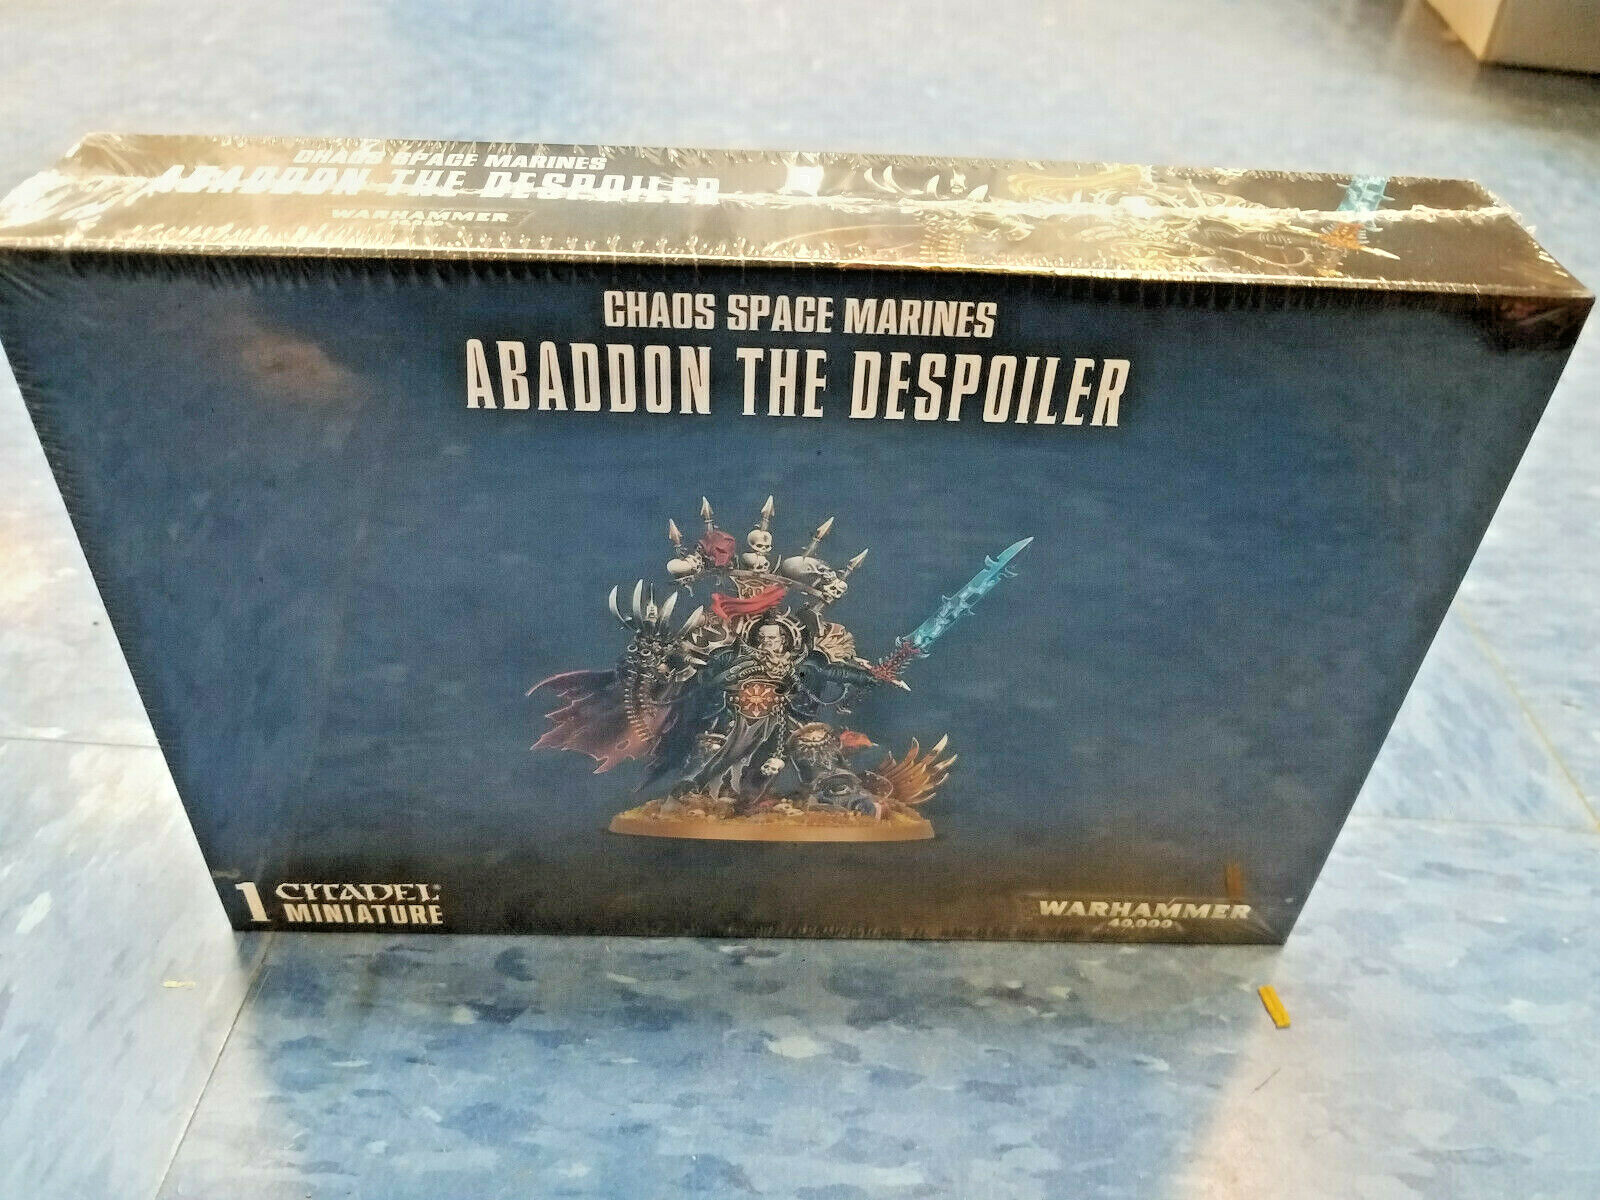 Abaddon the Despoiler Chaos Space Marines Warhammer 40k 40,000 Games Workhop